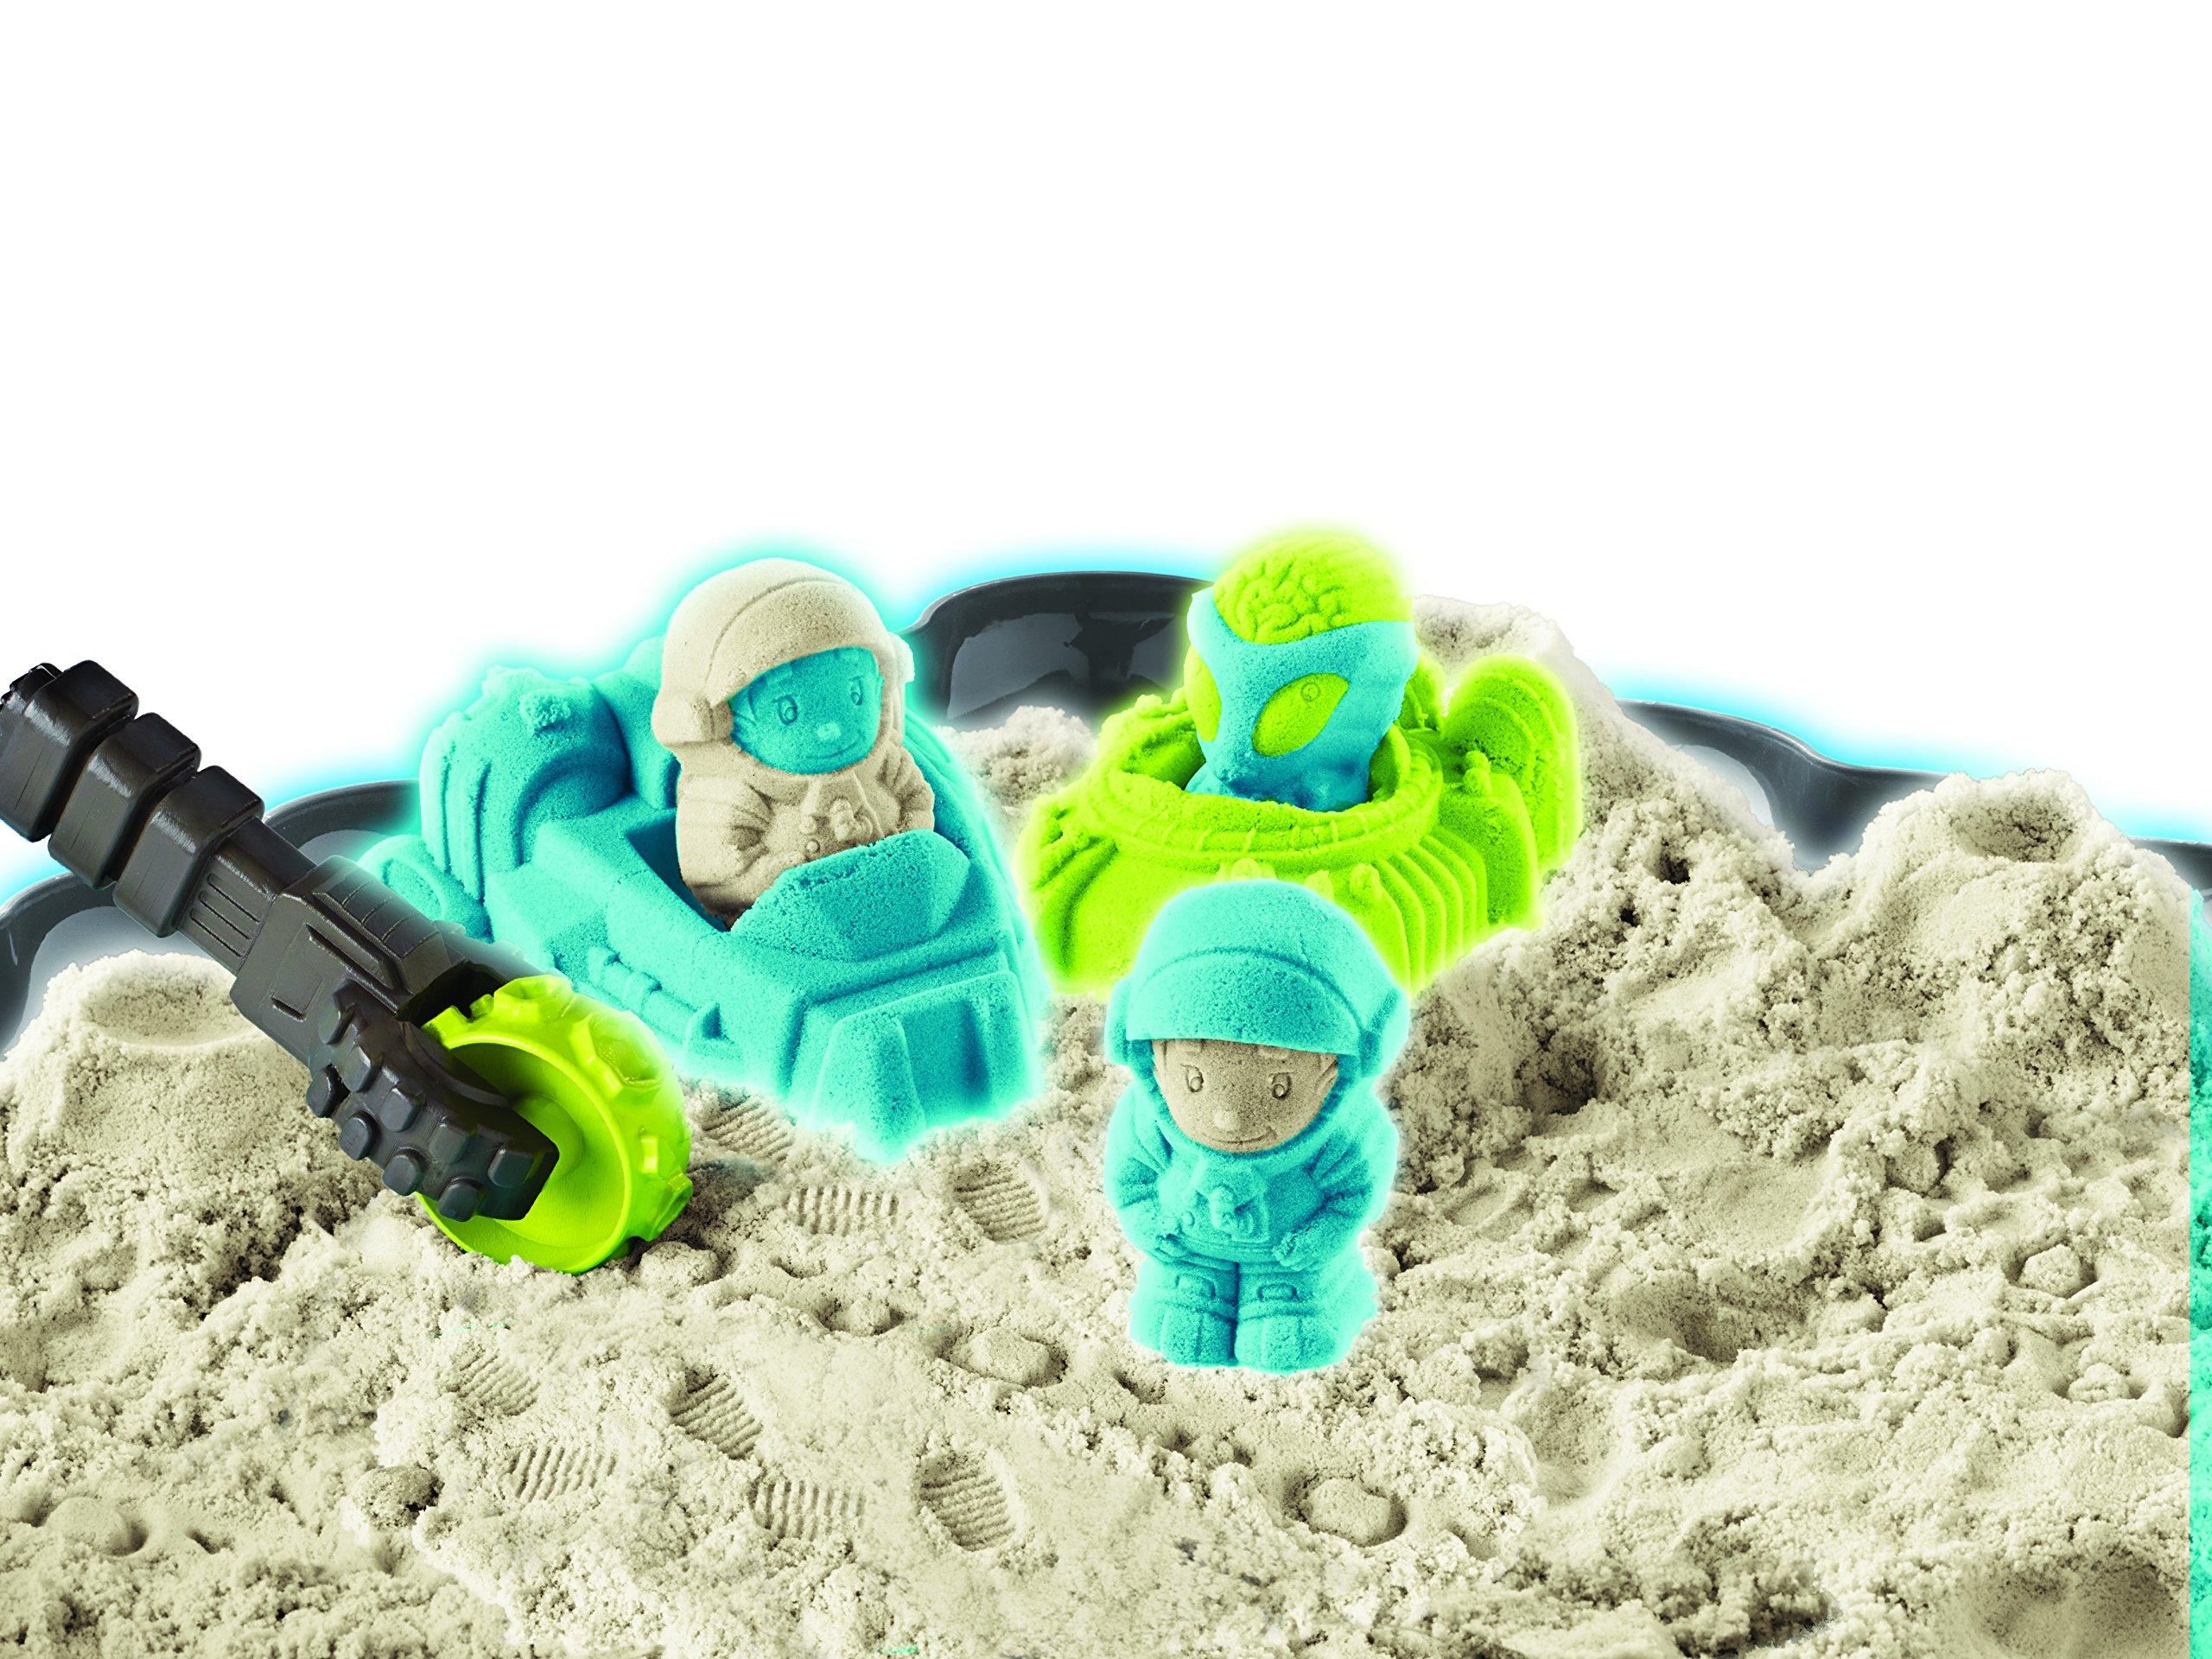 Cra-Z-Art Cra-Z-Sand Glow Sand Space Set Toy by Cra-Z-Art (Image #2)